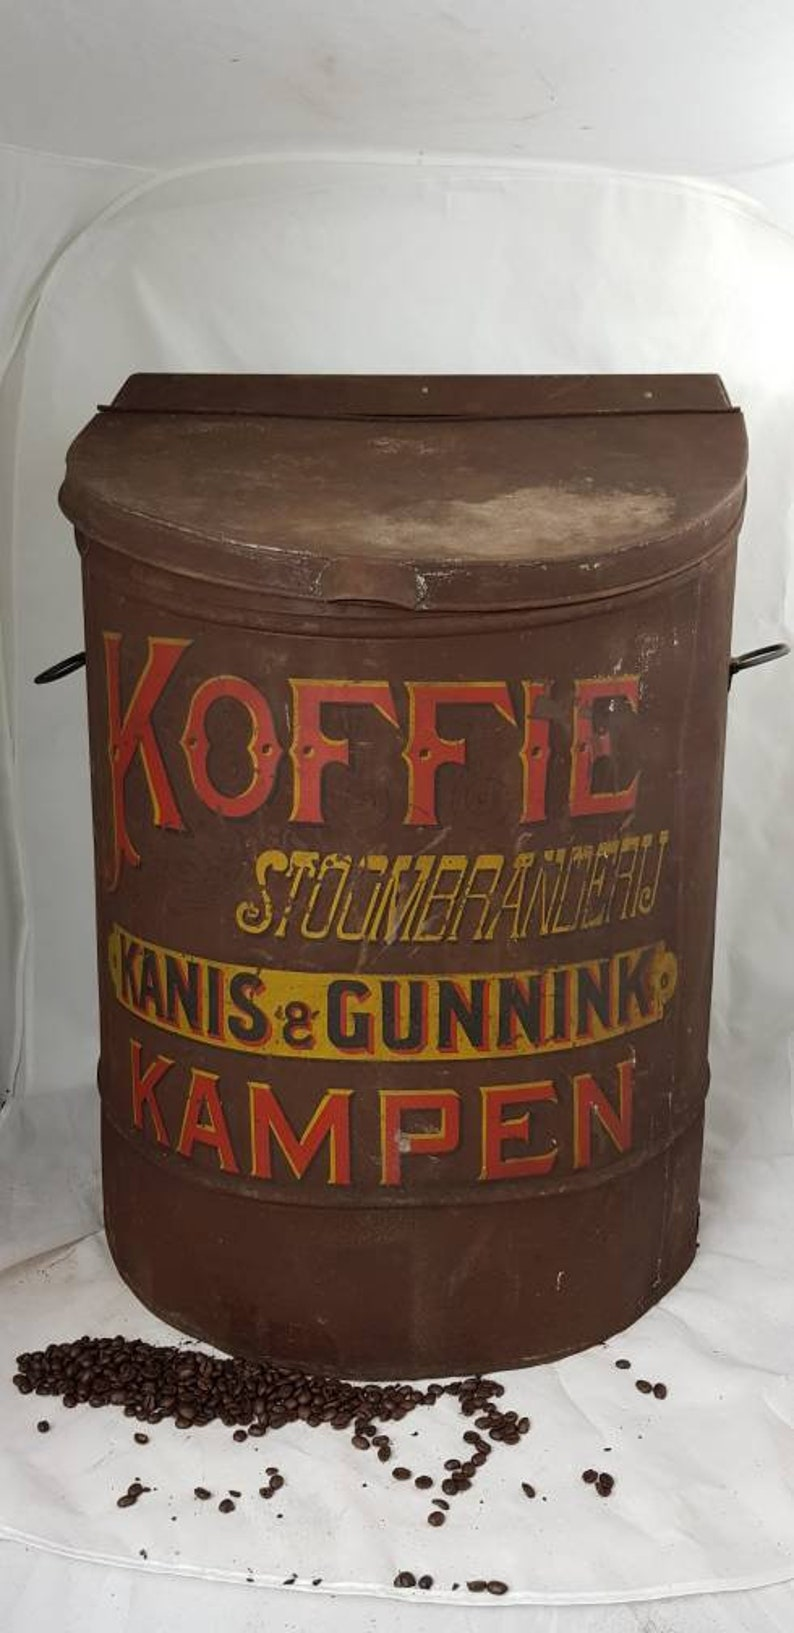 Hugh KANIS /& GUNNINK Kampen Metal Coffee Tin c1920 Dutch Coffee Box Jar Canister Bin Megalarge Rare Netherlands